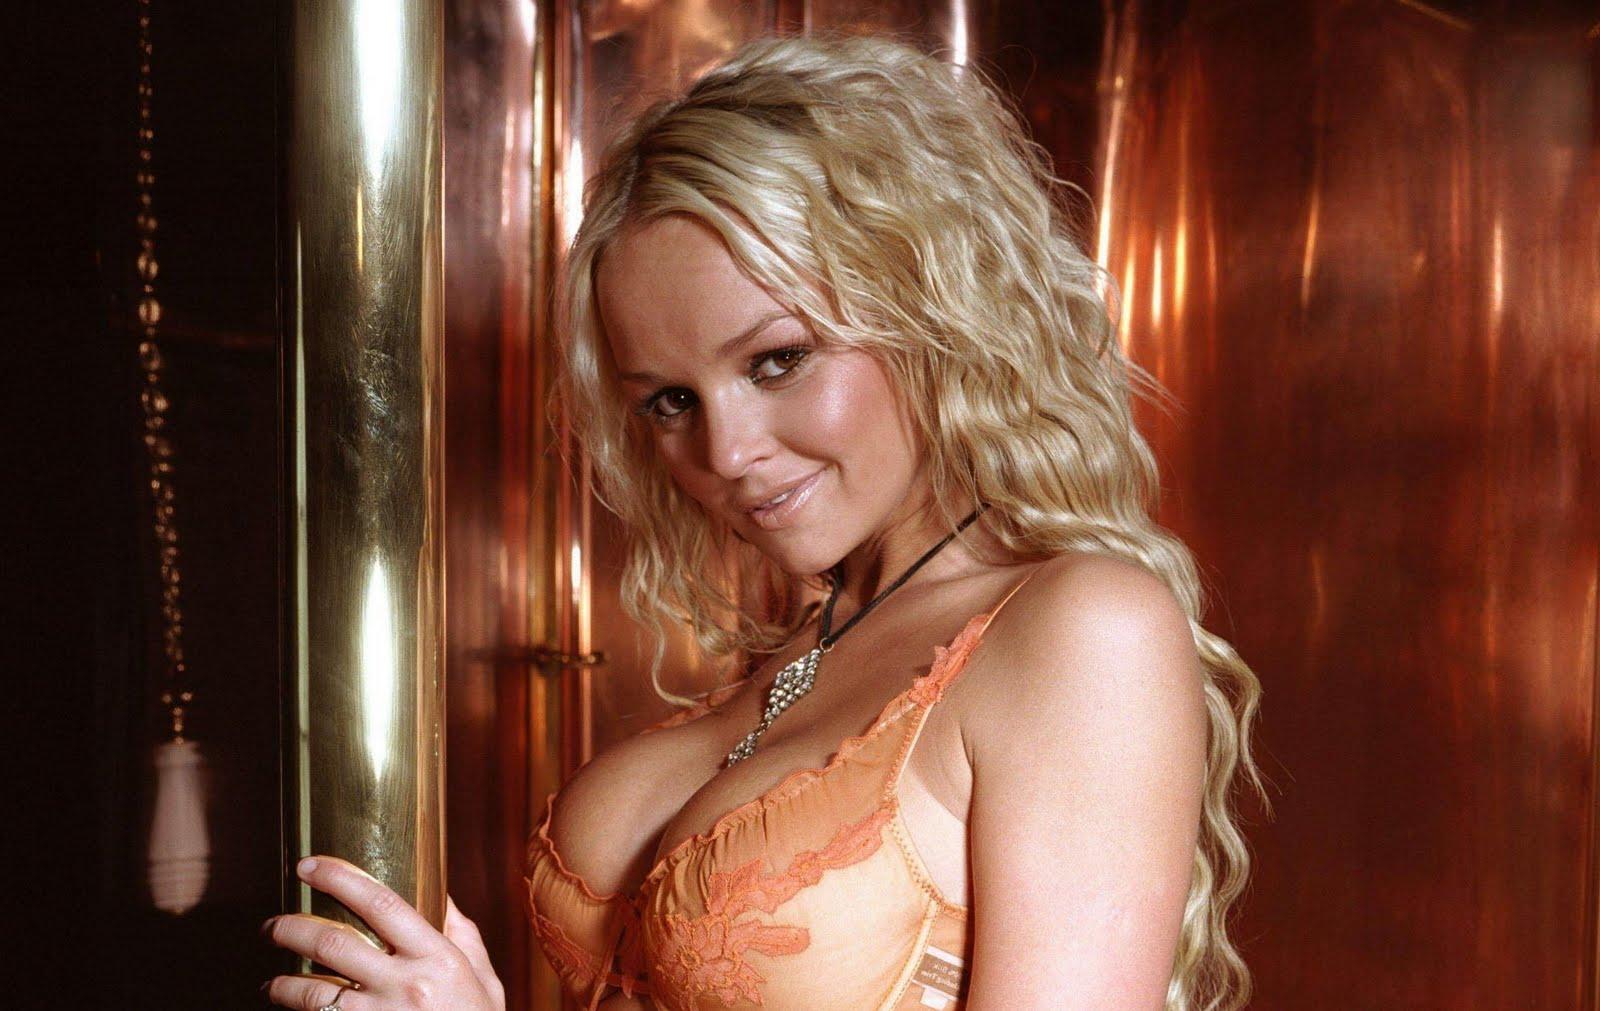 http://1.bp.blogspot.com/-yrW7VuPamWw/TeCZ1gC0XBI/AAAAAAAAP5A/CZMWmWYJUV4/s1600/Jennifer%2BEllison8.jpg